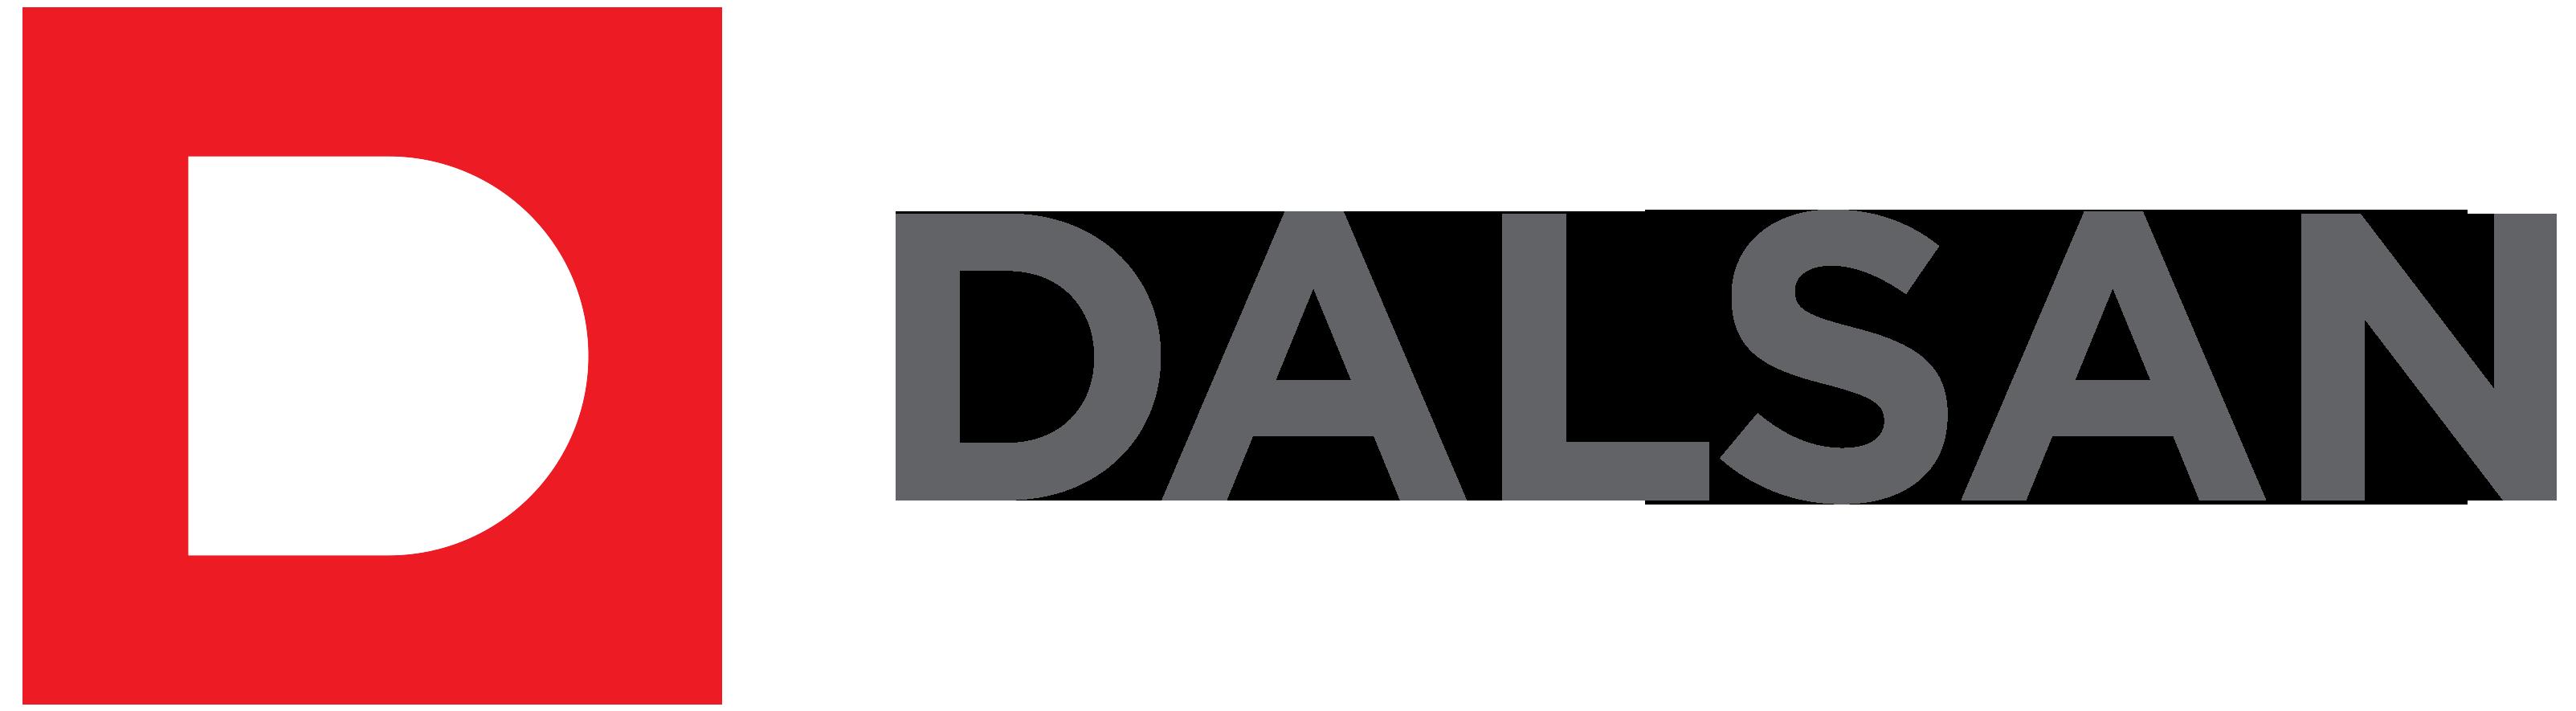 https://wwwi.globalpiyasa.com/lib/logo/49382/ddb25e1e3f7fc44095dfce9baf81990d.png